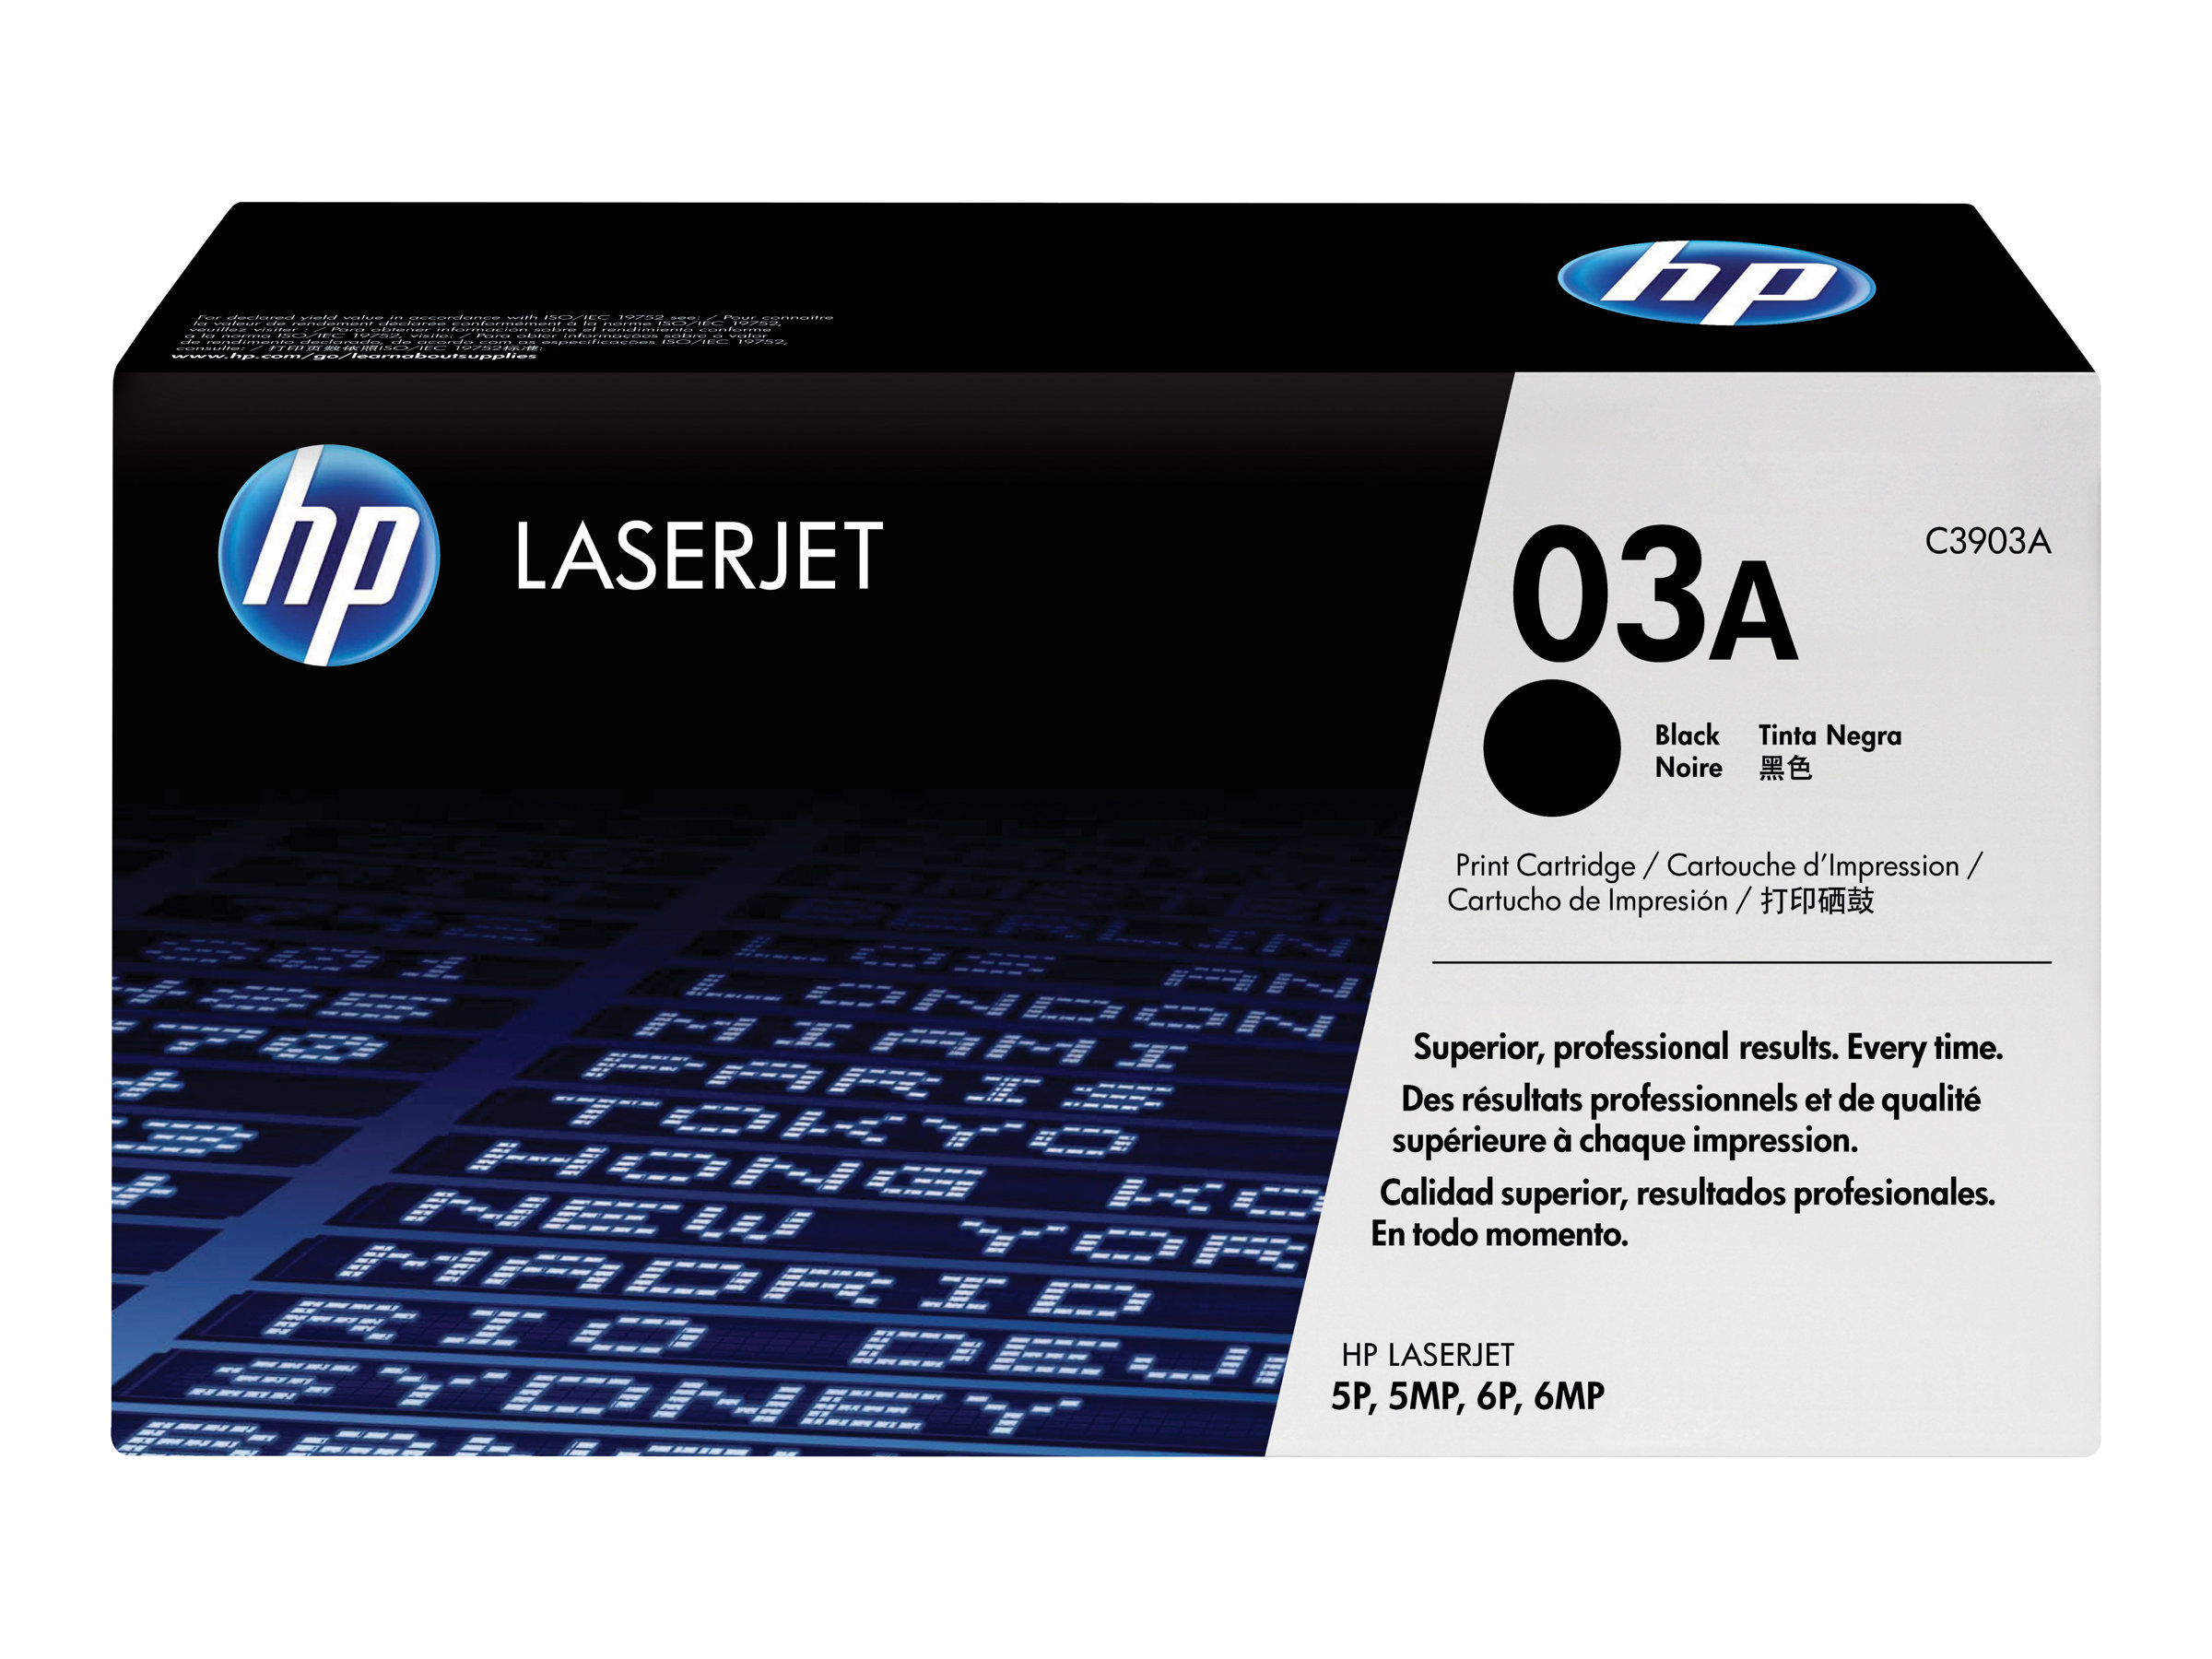 HP 03A - Schwarz - Original - LaserJet - Tonerpatrone (C3903A) - für LaserJet 5, 5mp, 5p, 6mp, 6p, 6pse, 6pxi